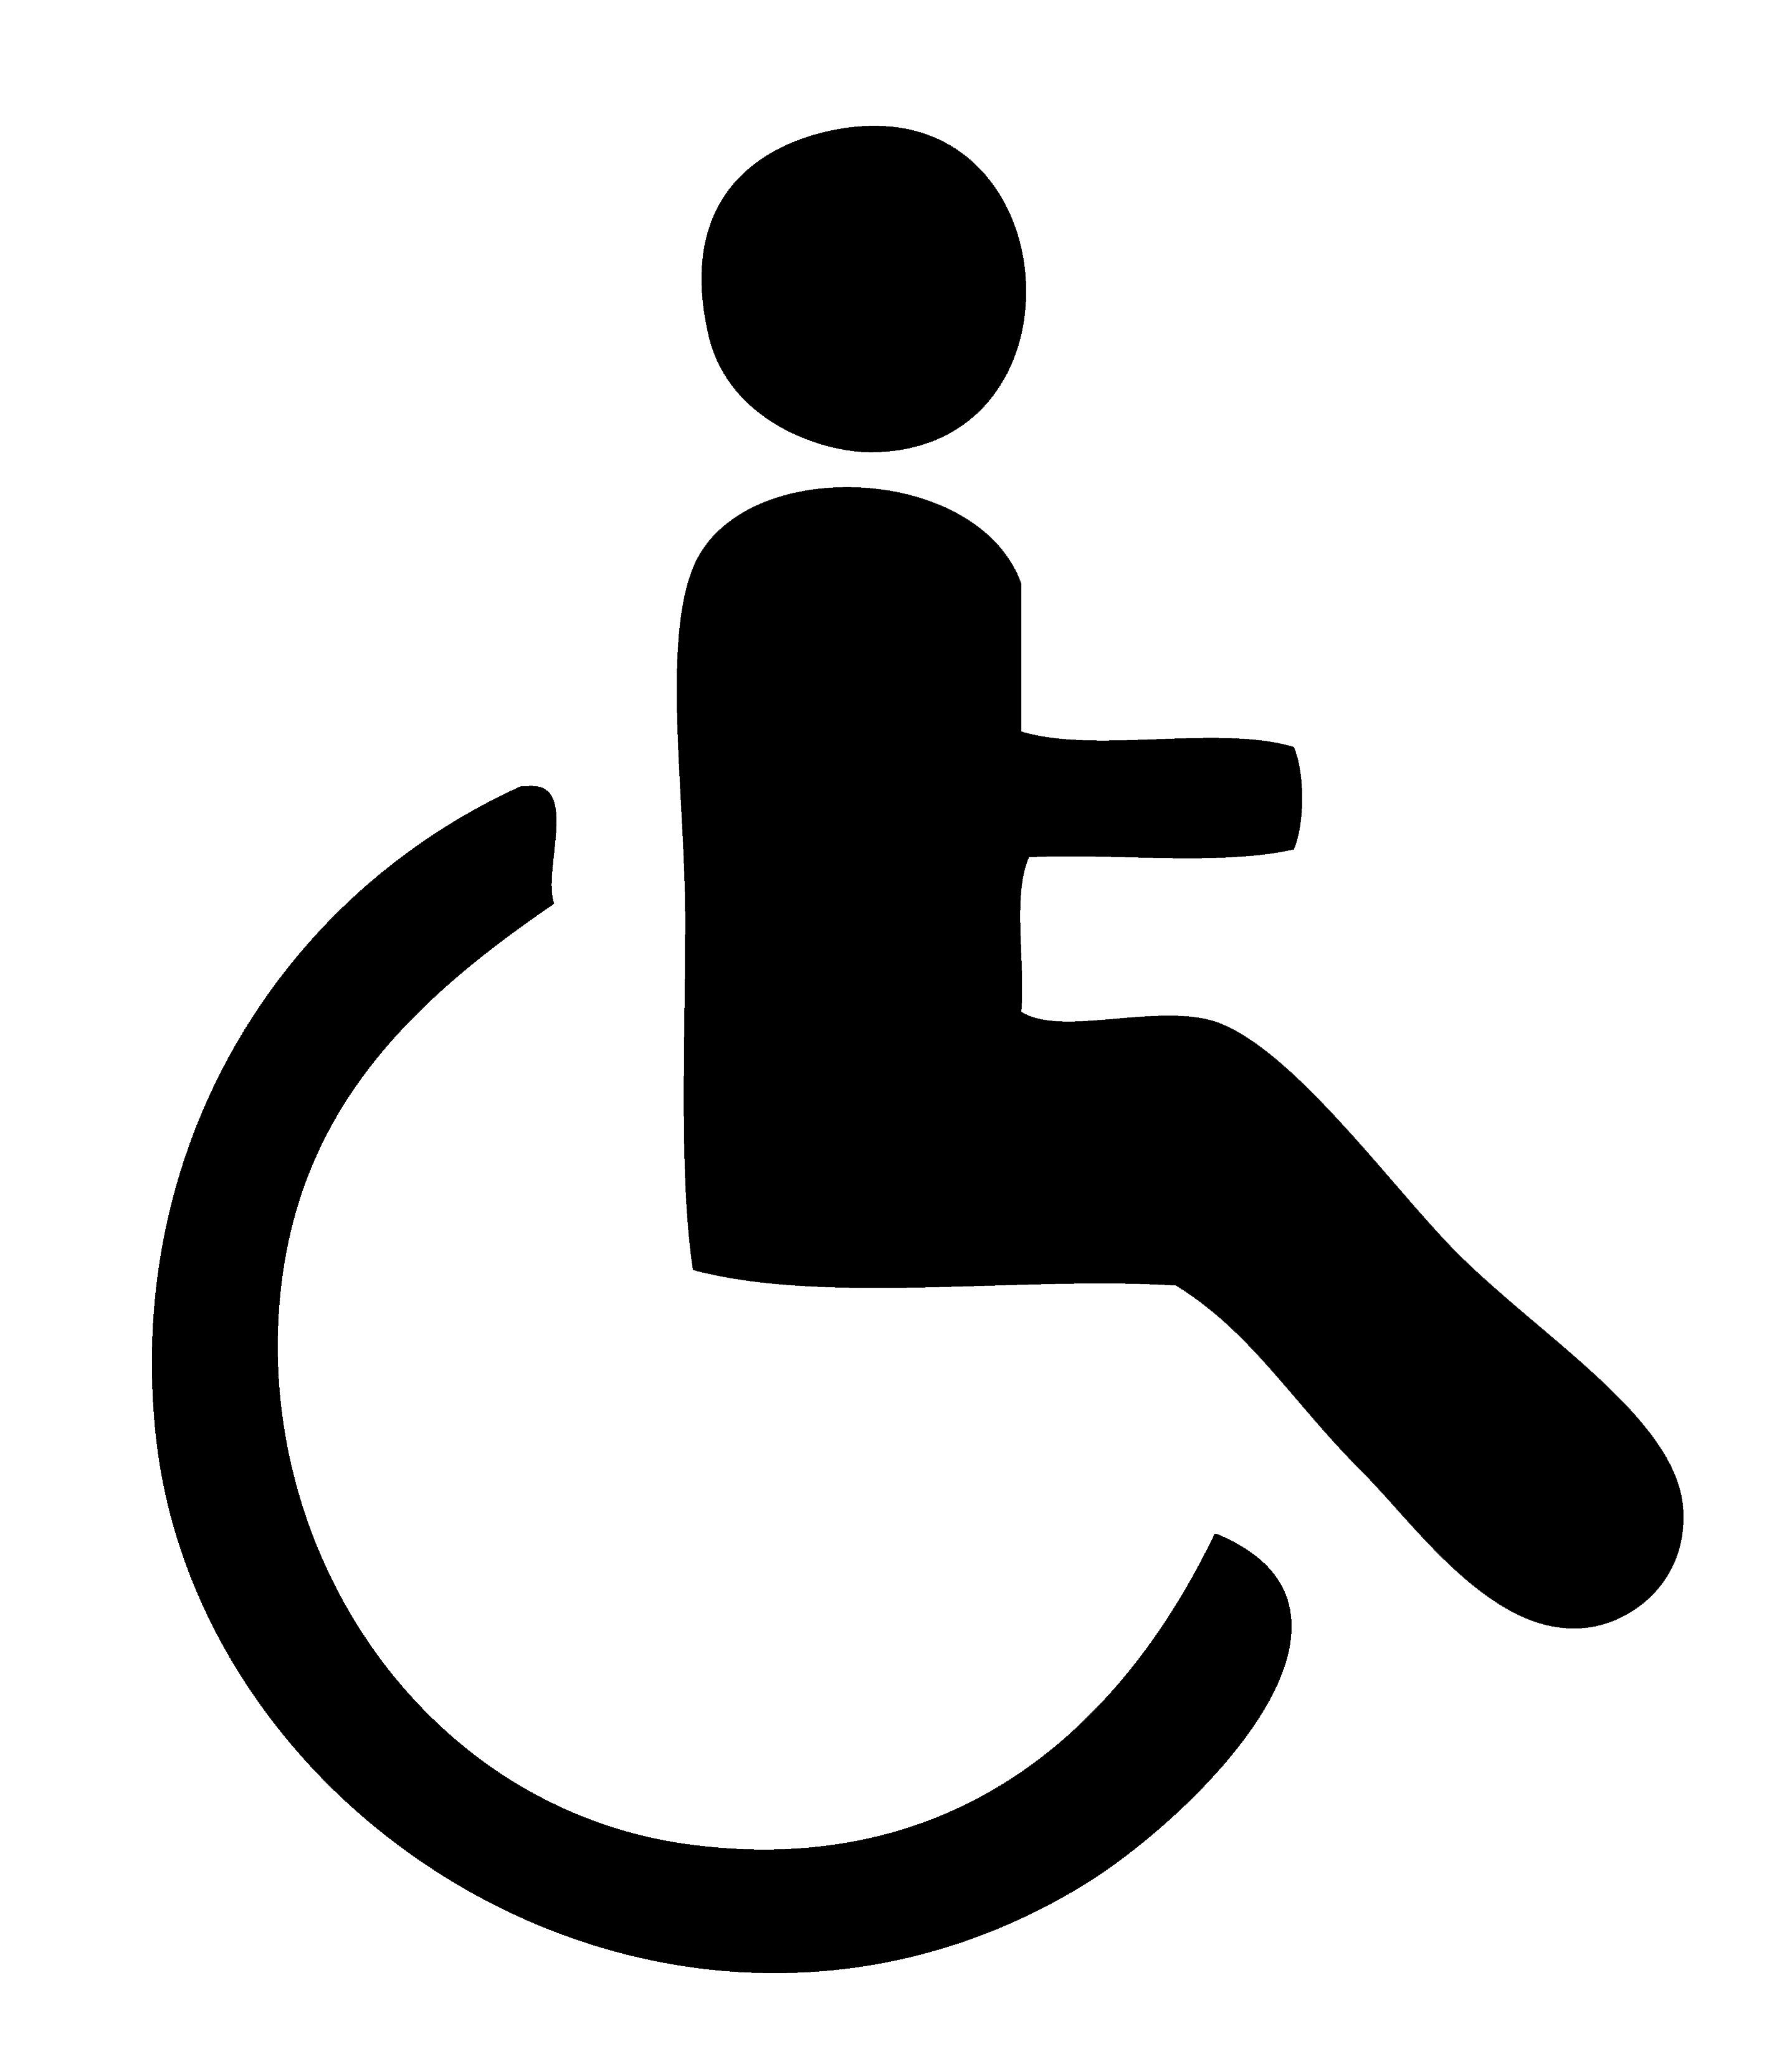 handicap symbol clip art - photo #42